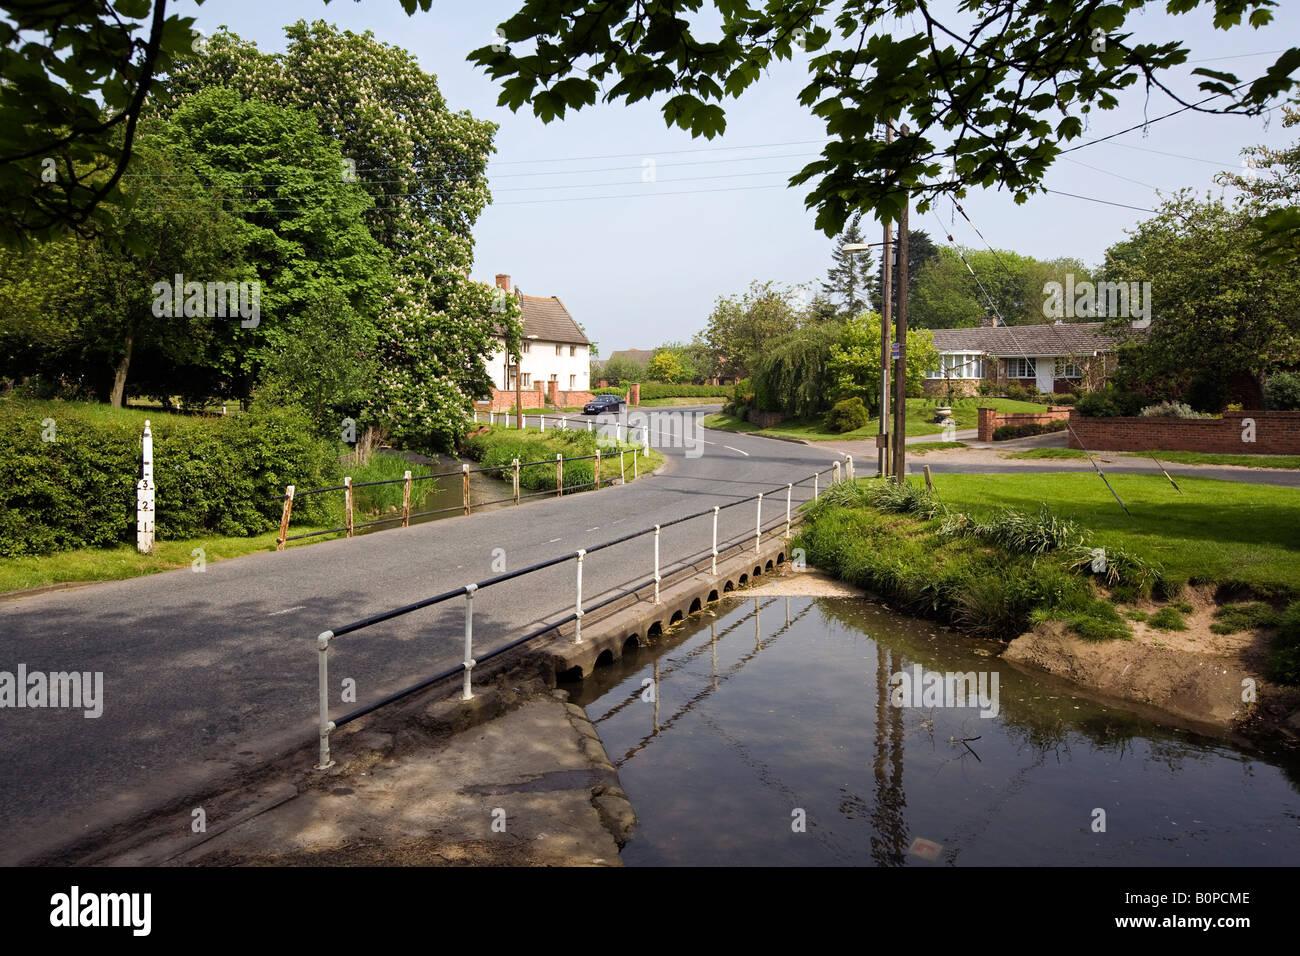 UK England Lincolnshire Bottesford road crossing River Devon near Flemings Hospital almshouses - Stock Image